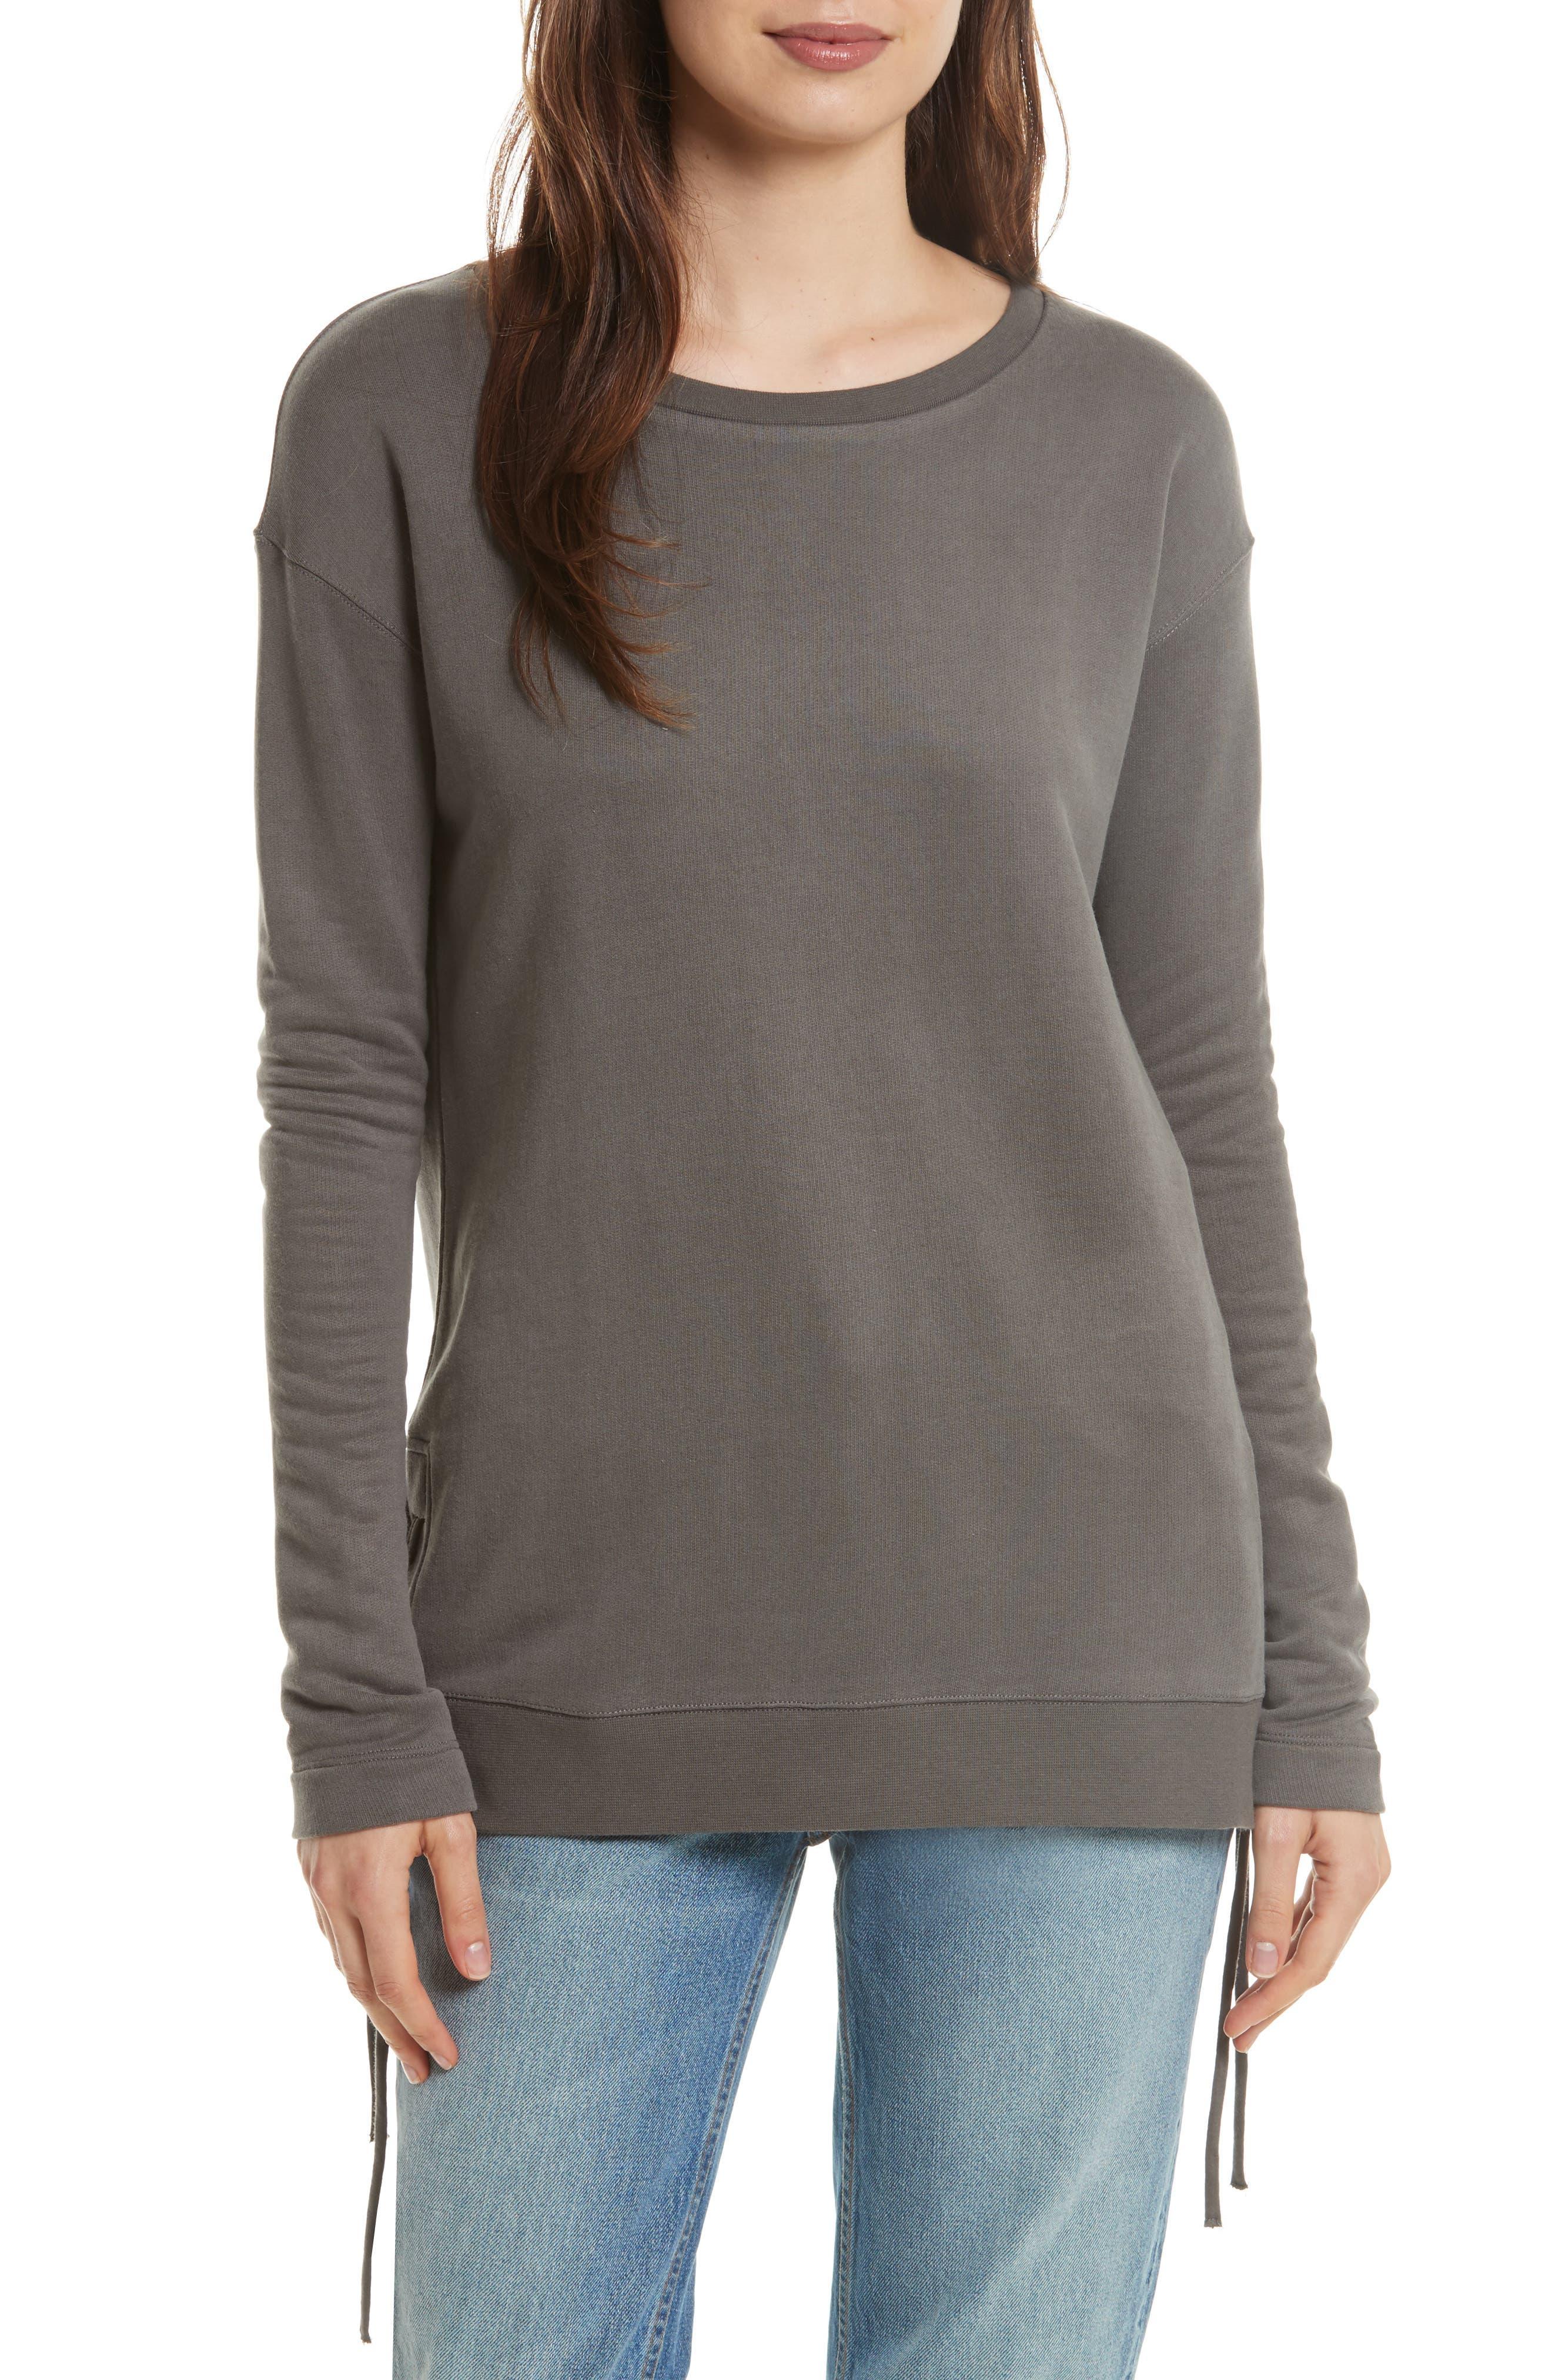 Majestic Filatures Lace Up Sweater